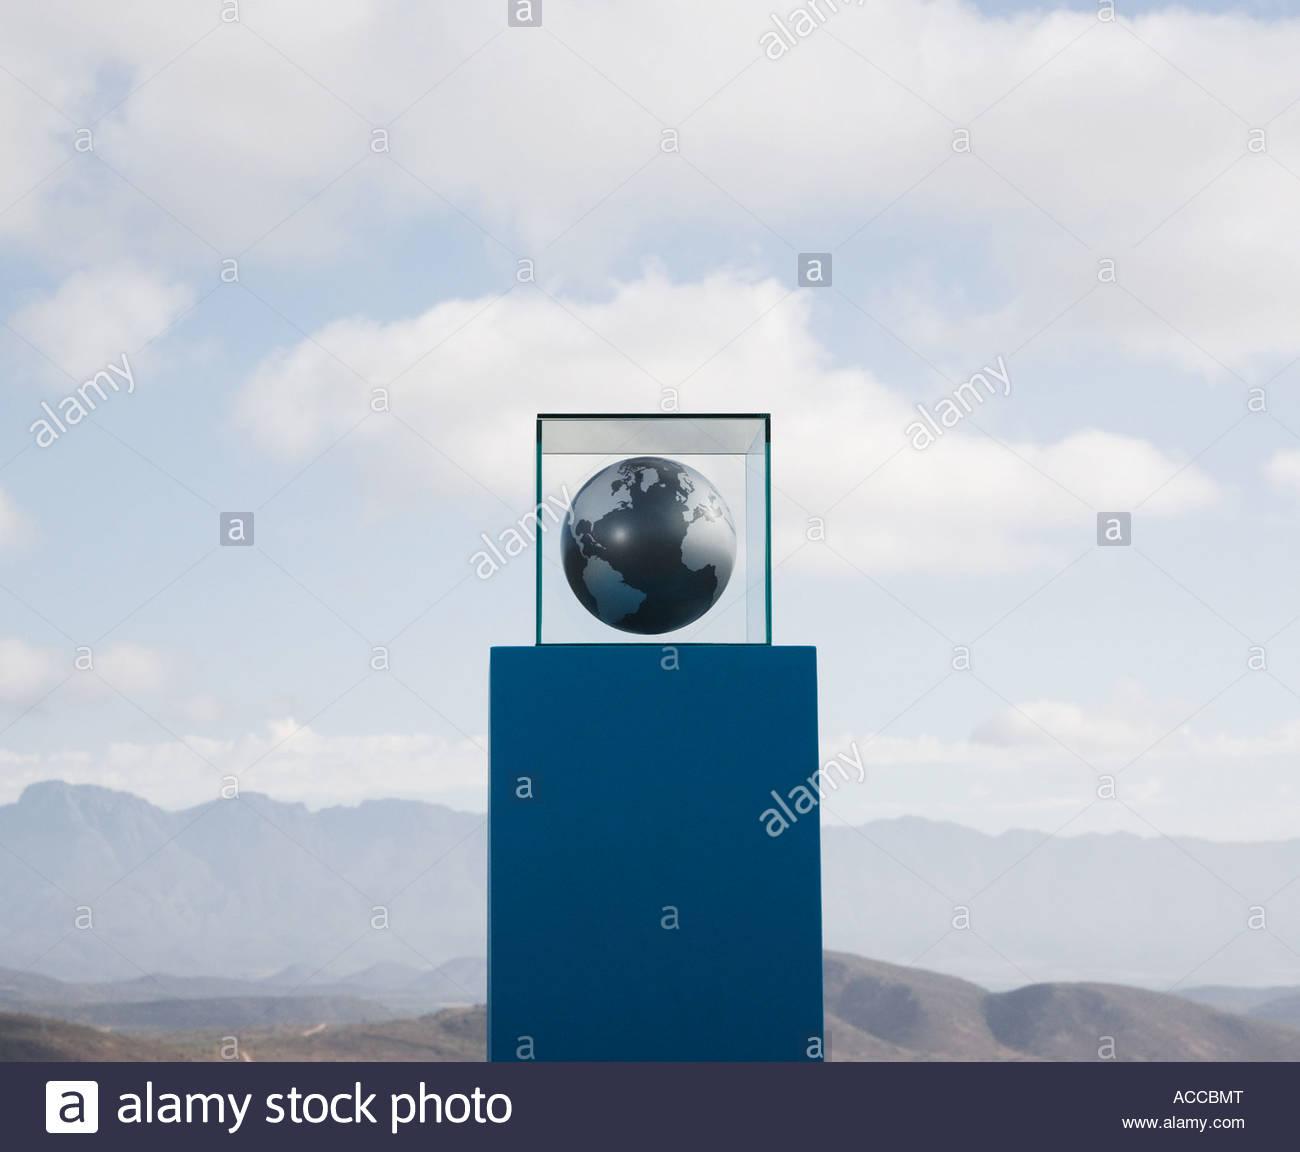 Globe in glass box on pedestal - Stock Image